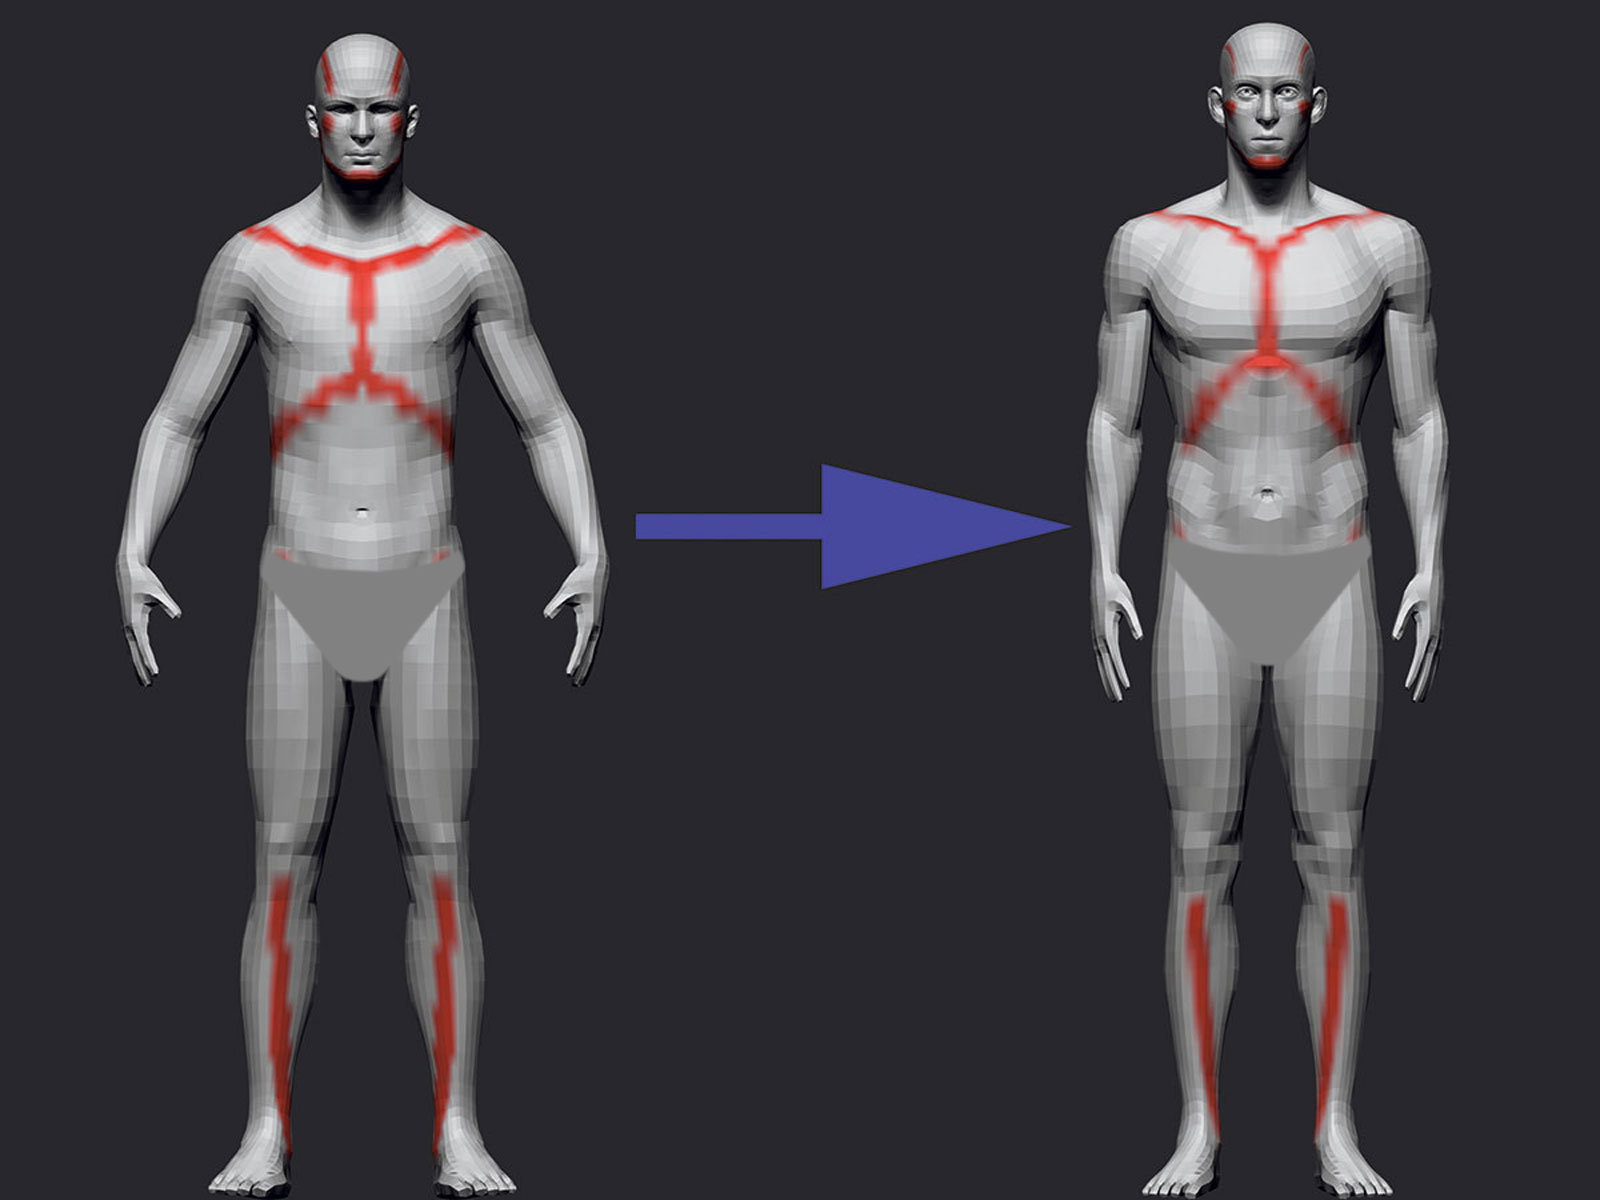 mojasamesazi anatomi zibrush9 1 - آموزش ساخت آناتومی در زیبراش